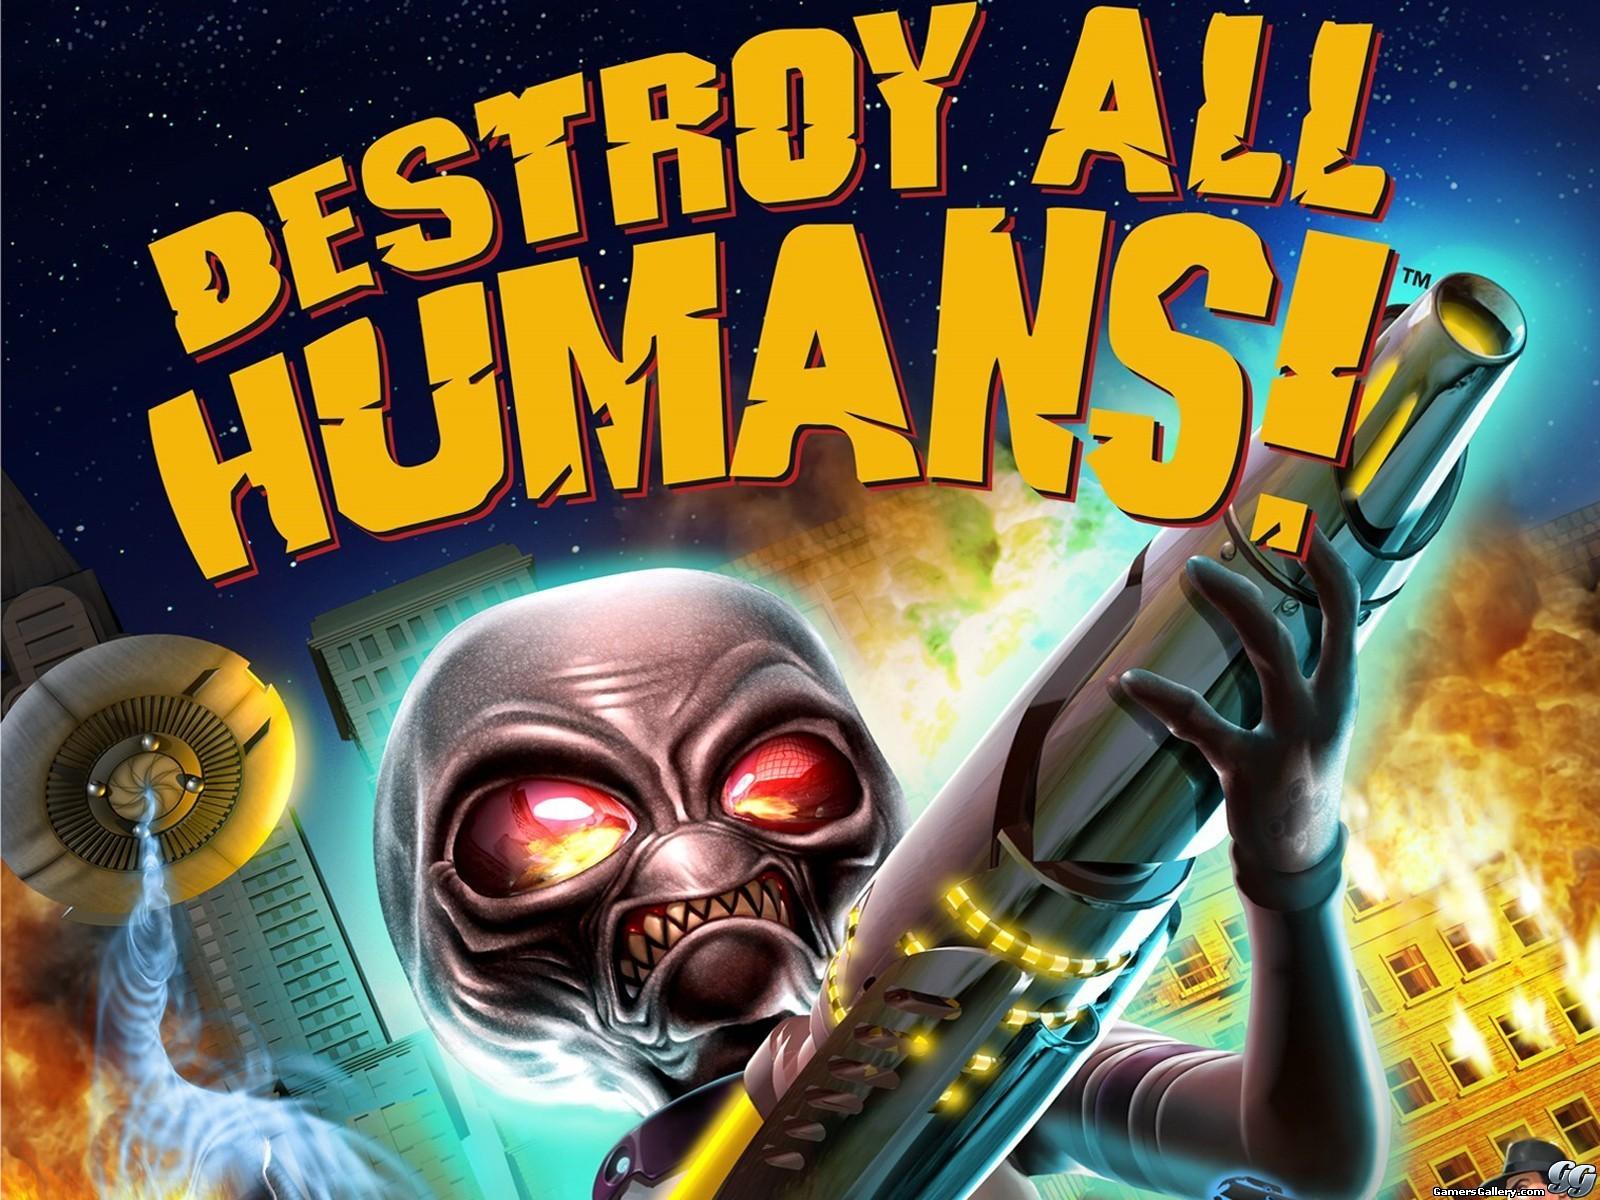 destroy all humans by onlytodownload fan art wallpaper games 2009 2015 1600x1200